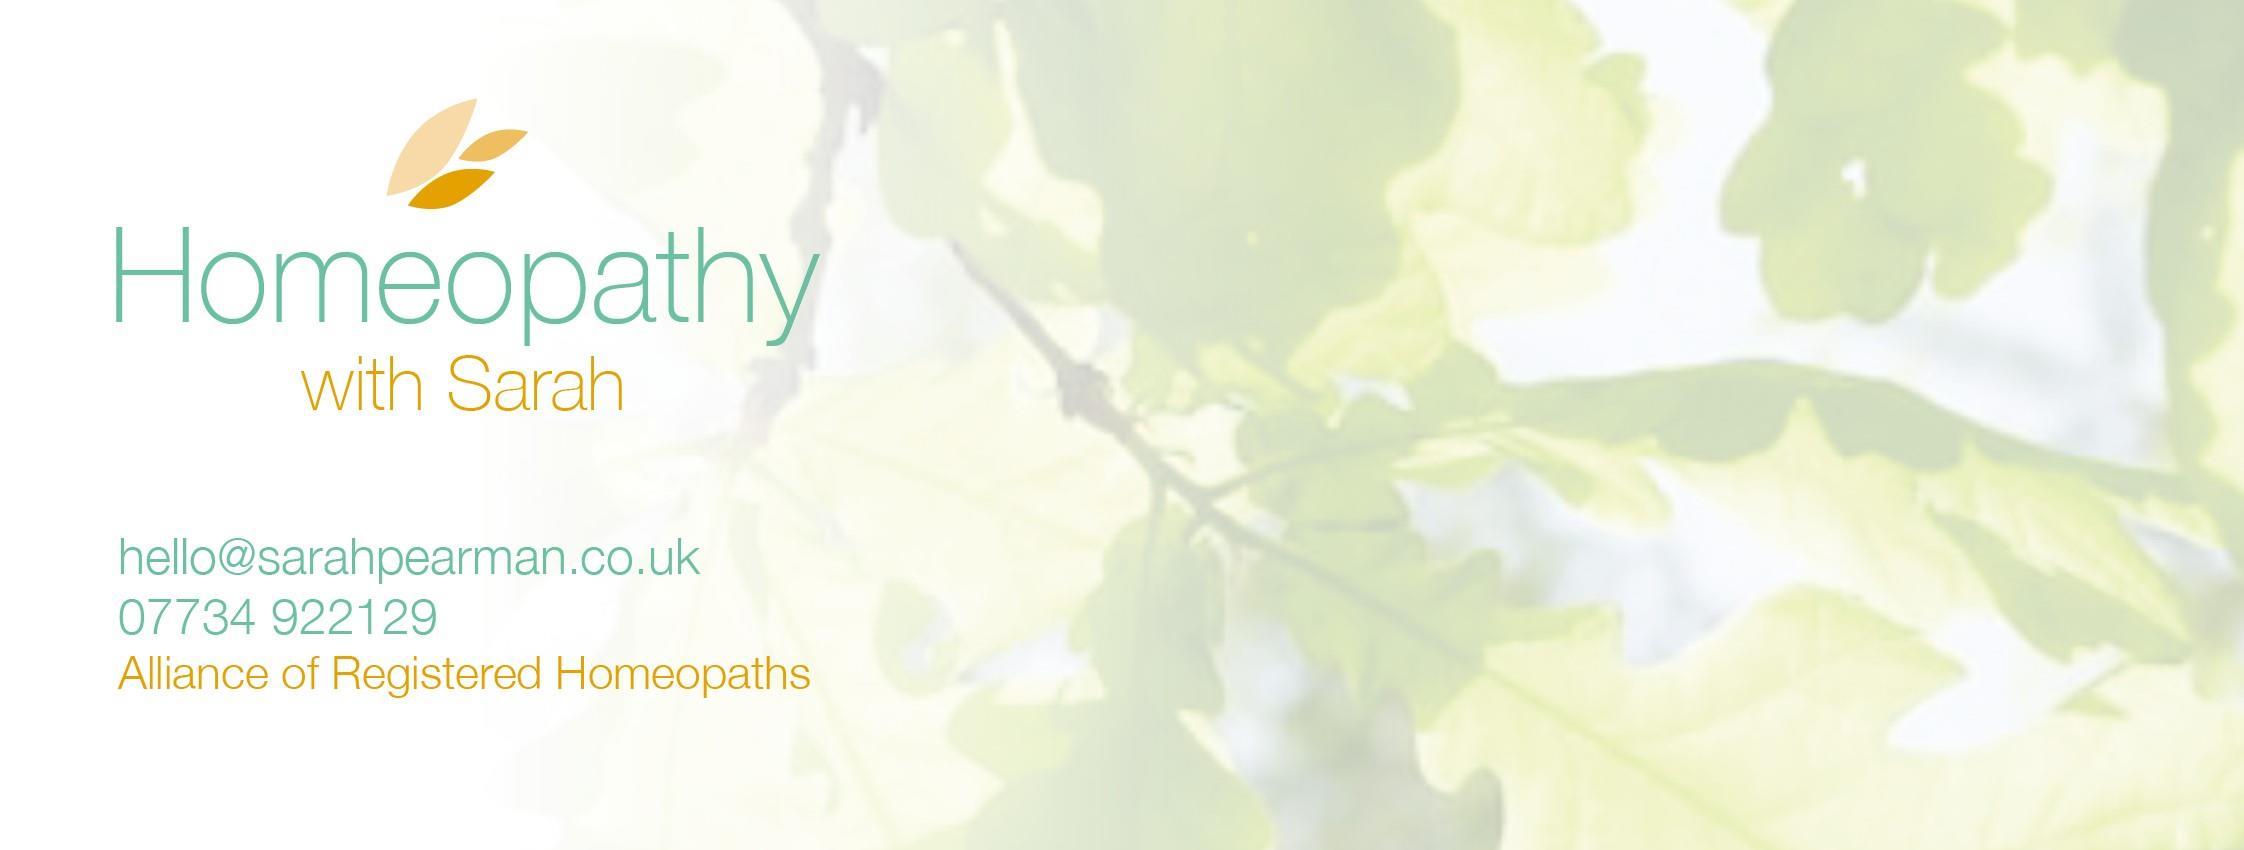 Homeopathy with Sarah